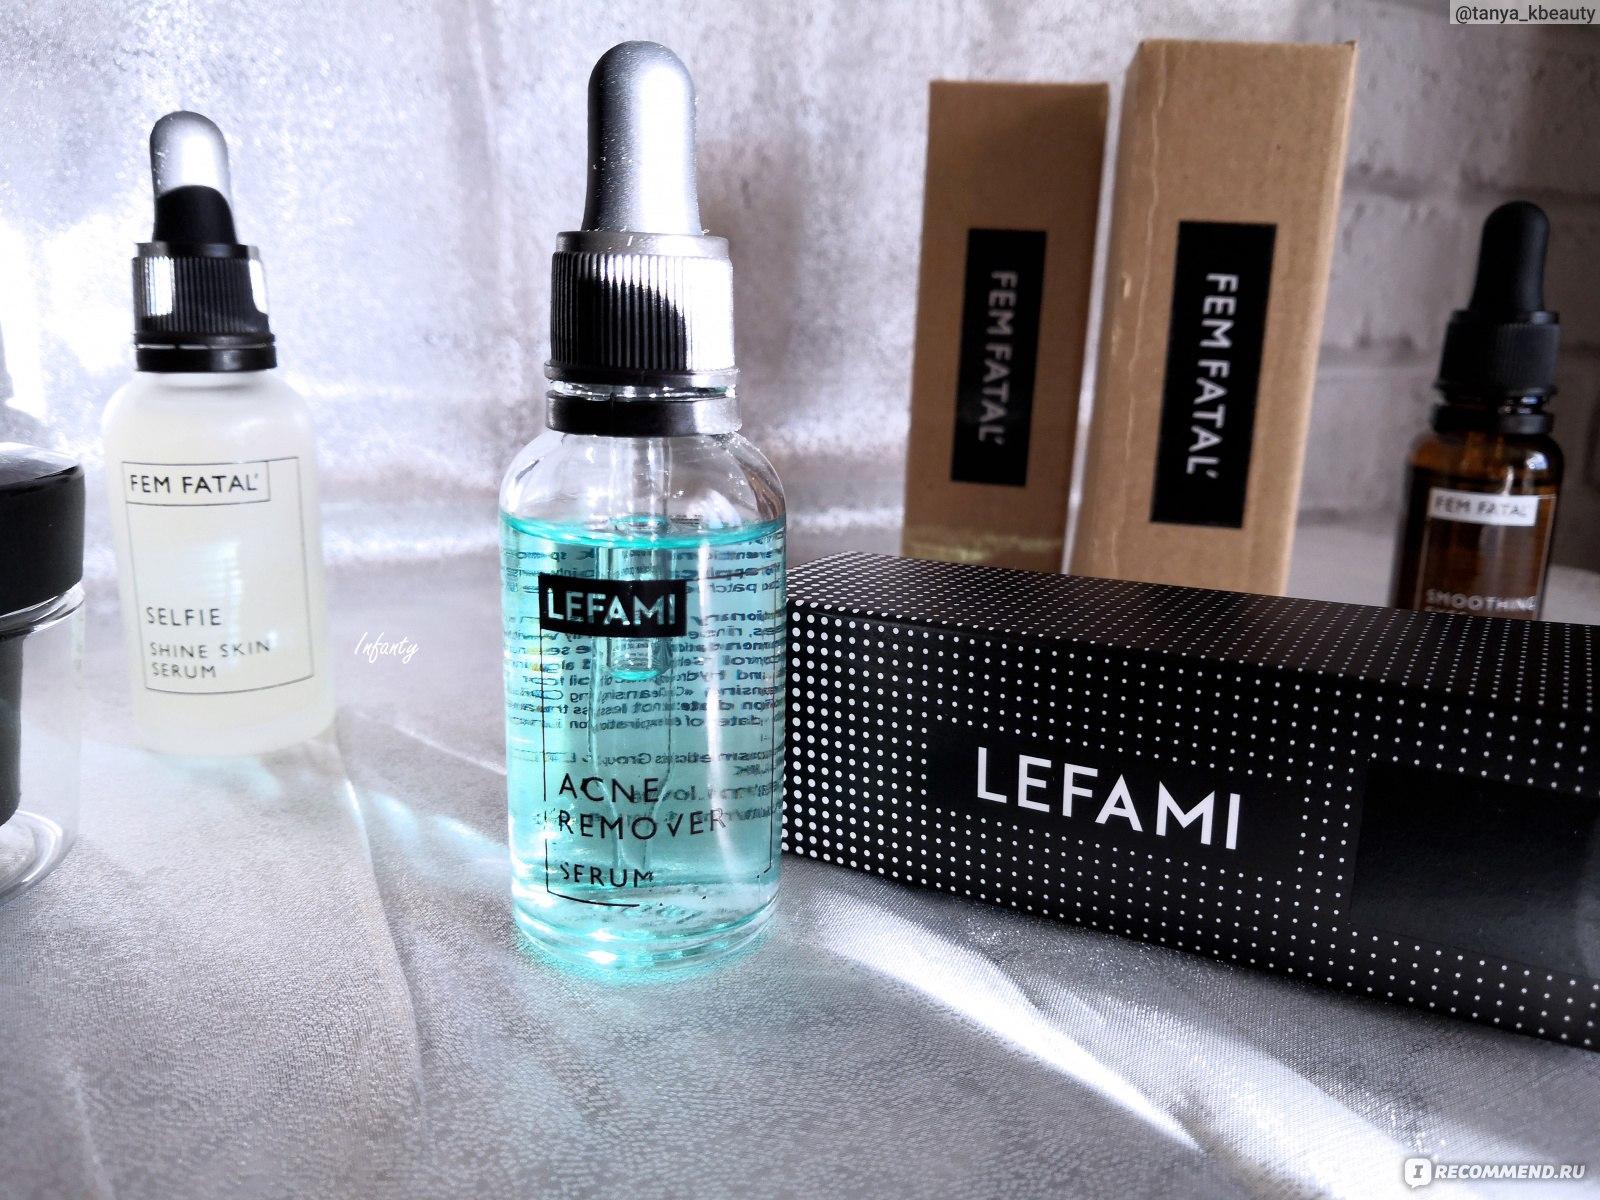 FEM FATAL' Acne Remover Serum - Infanty Beauty